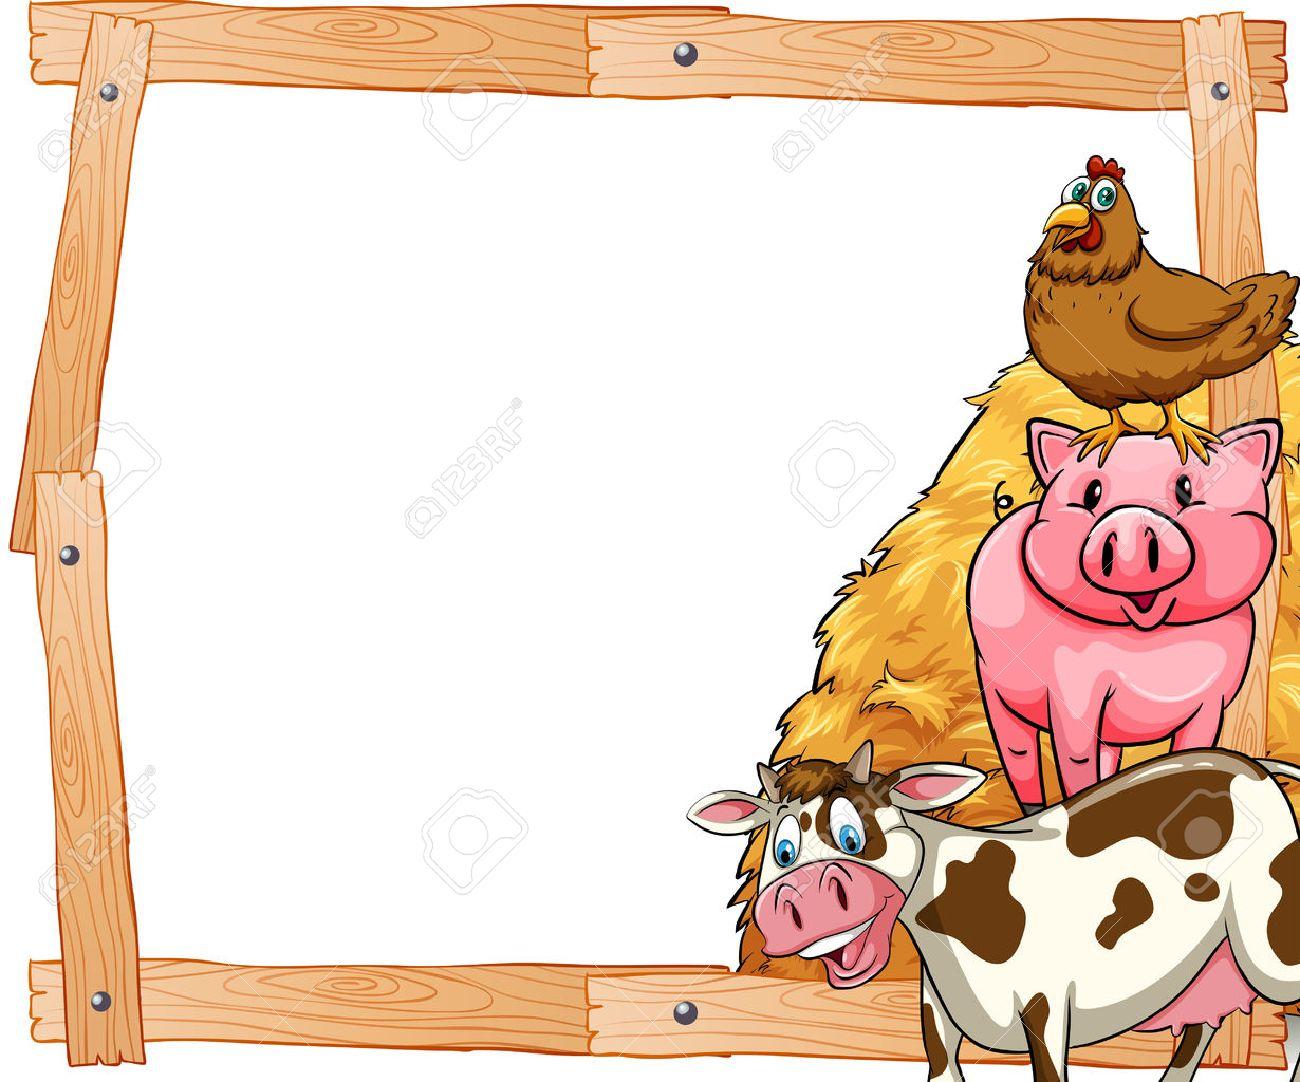 Farm Animals Frame Stock Photos. Royalty Free Farm Animals Frame Images